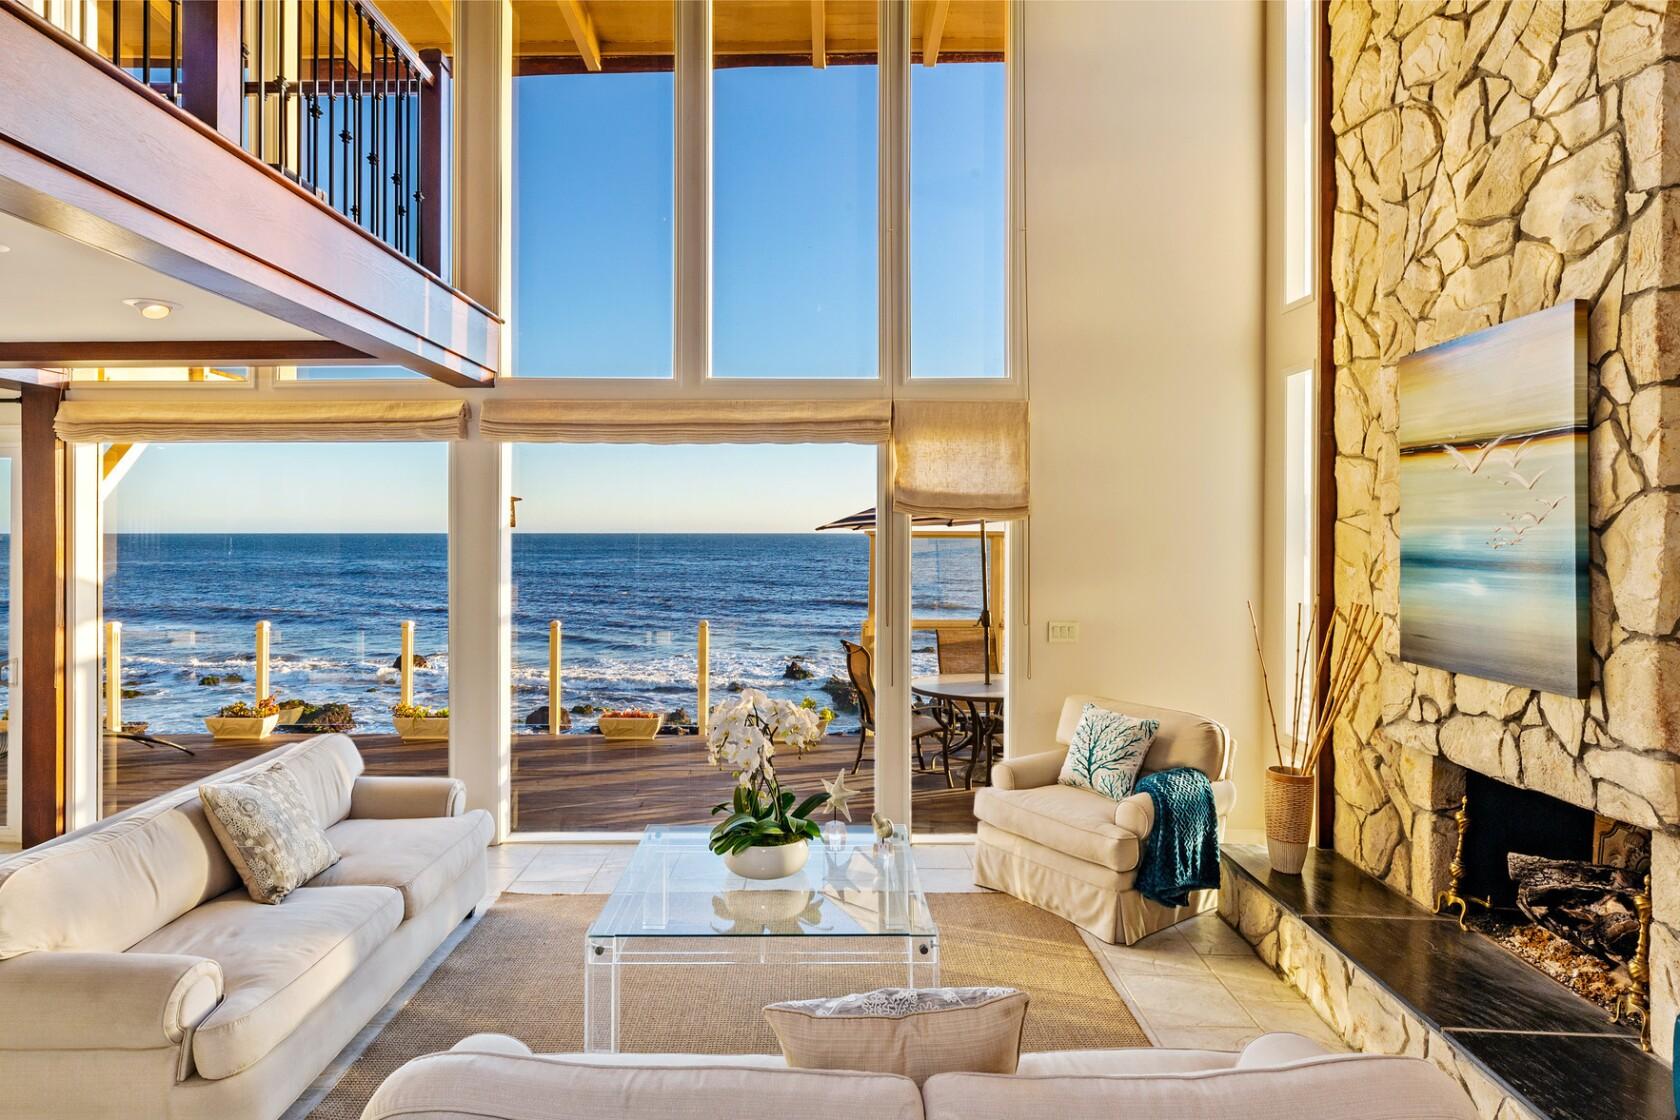 Brady Bunch' star Barry Williams lists Malibu beach house for $6 3